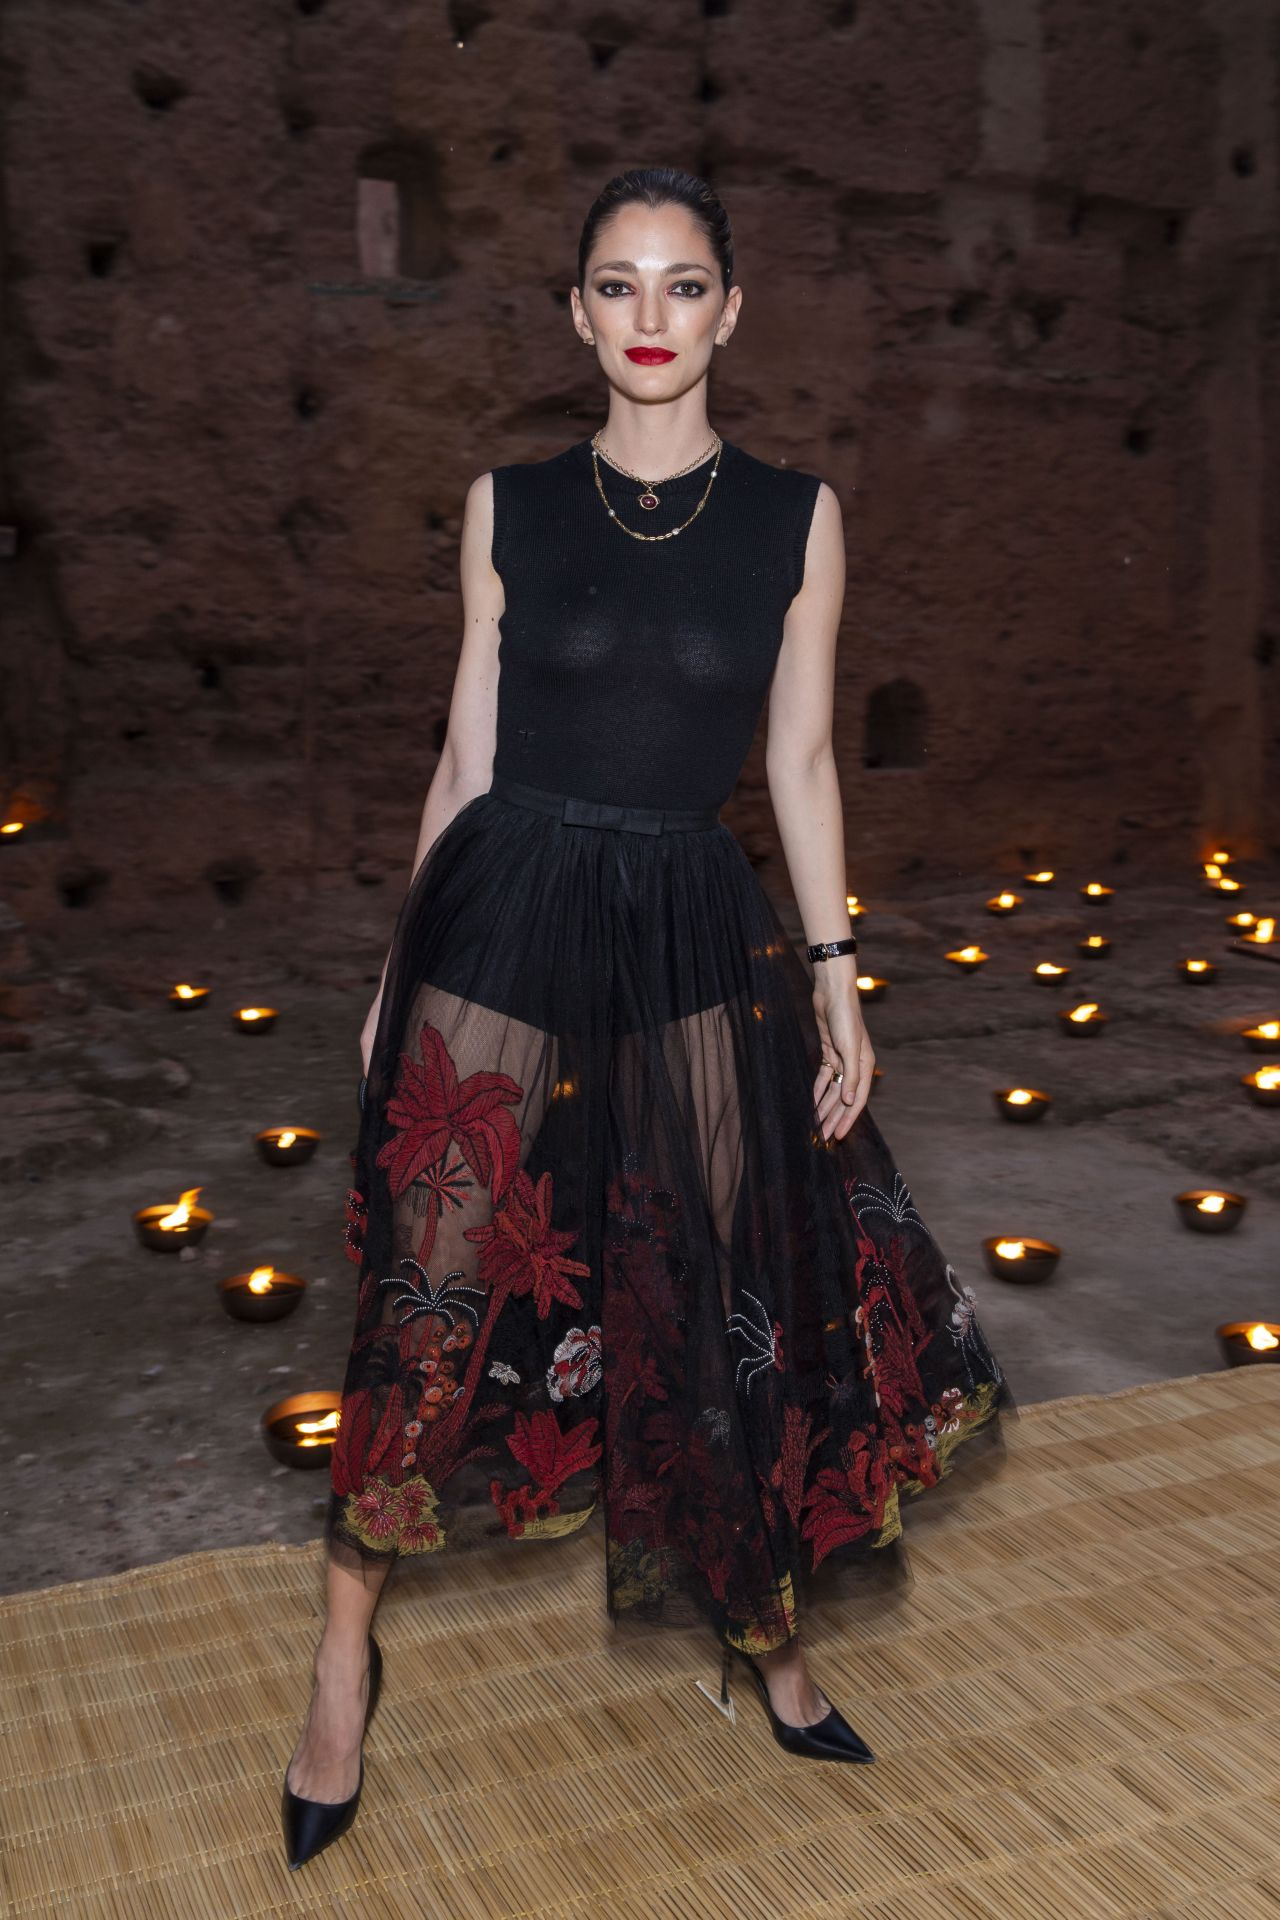 Sofia Sanchez Christian Dior Couture S S20 Cruise